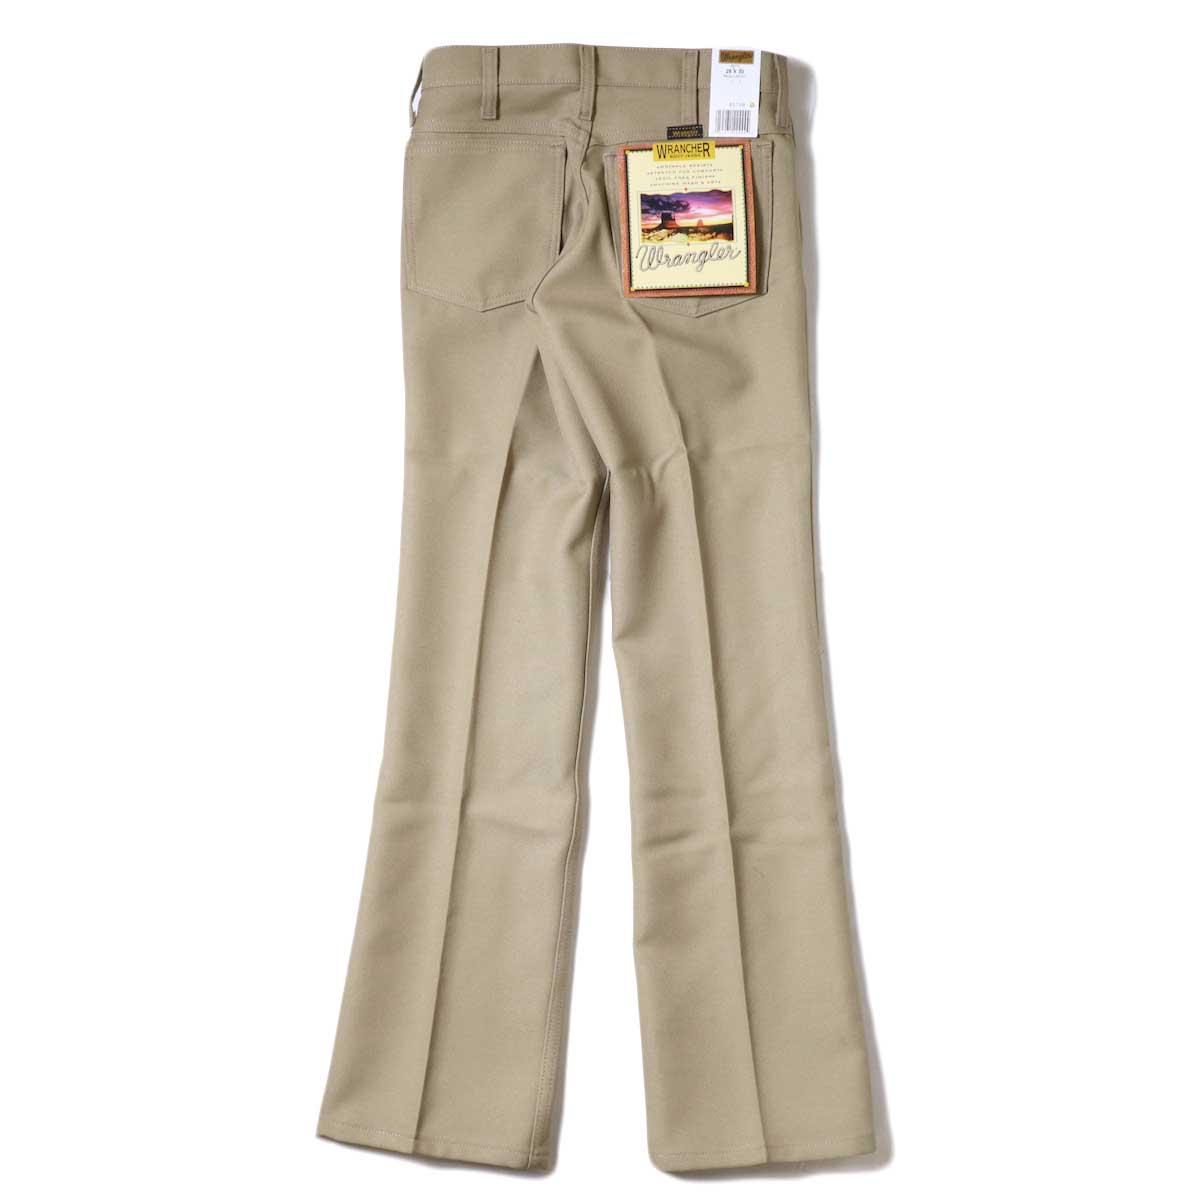 Wrangler / WRANCHER DRESS JEANS (Tan) 背面